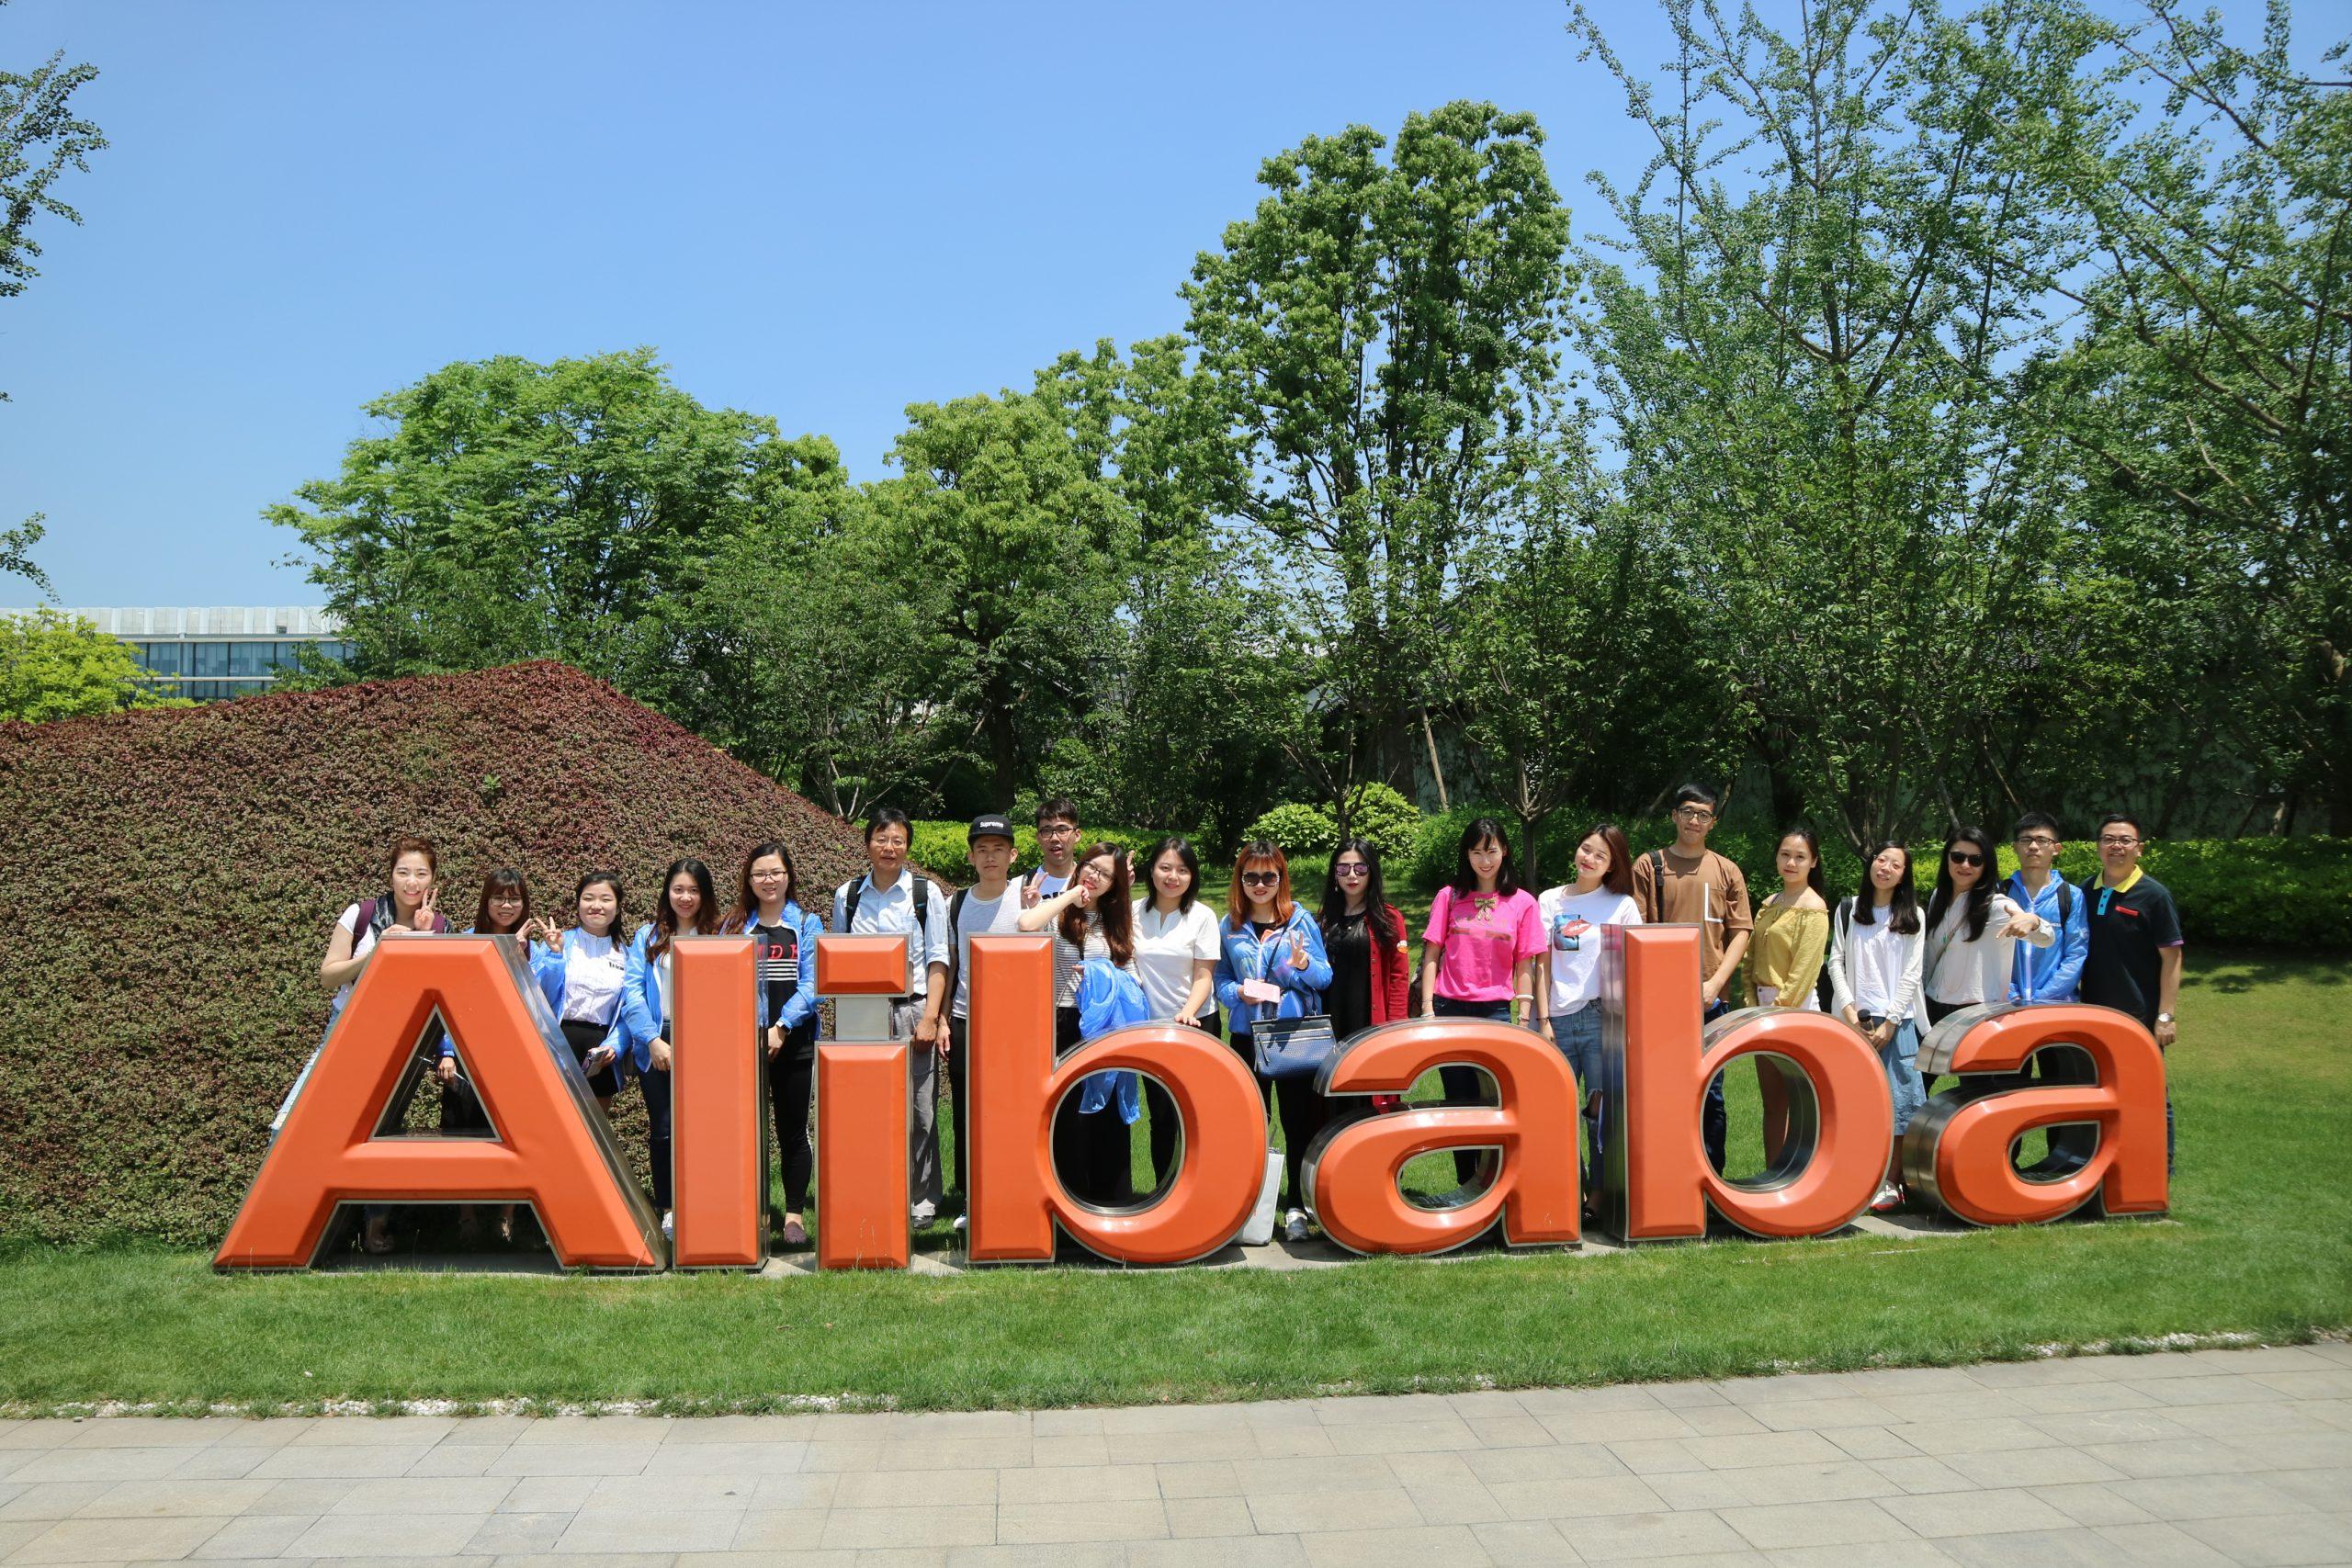 Company visit - Alibaba(China) Technology Co., LTD.